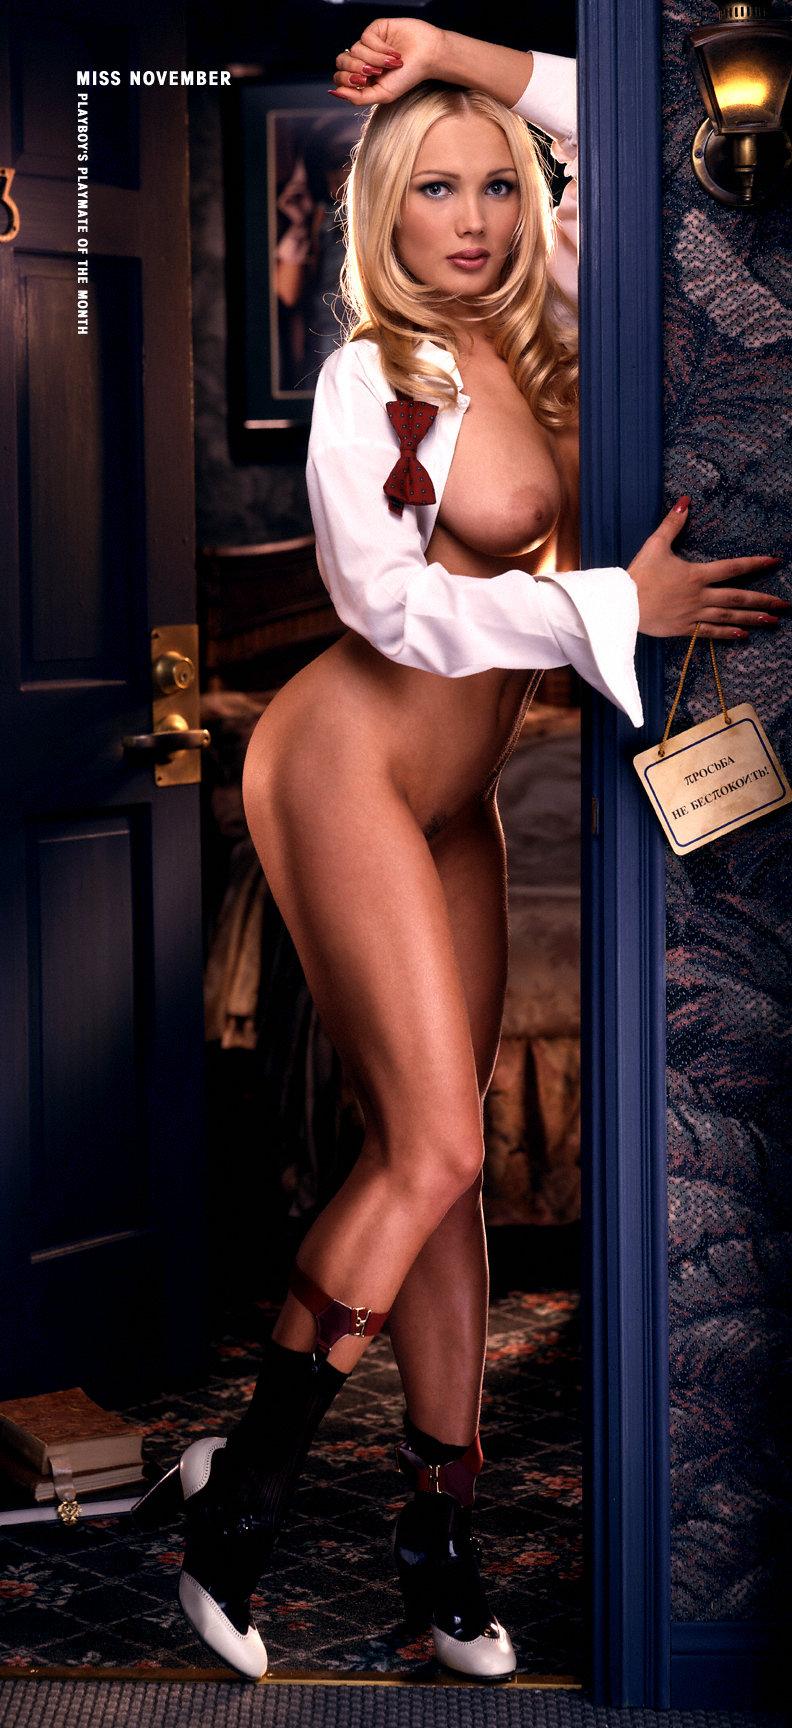 Anna Mucha Playboy nsfw november: inga drozdova, miss november 1997 | the